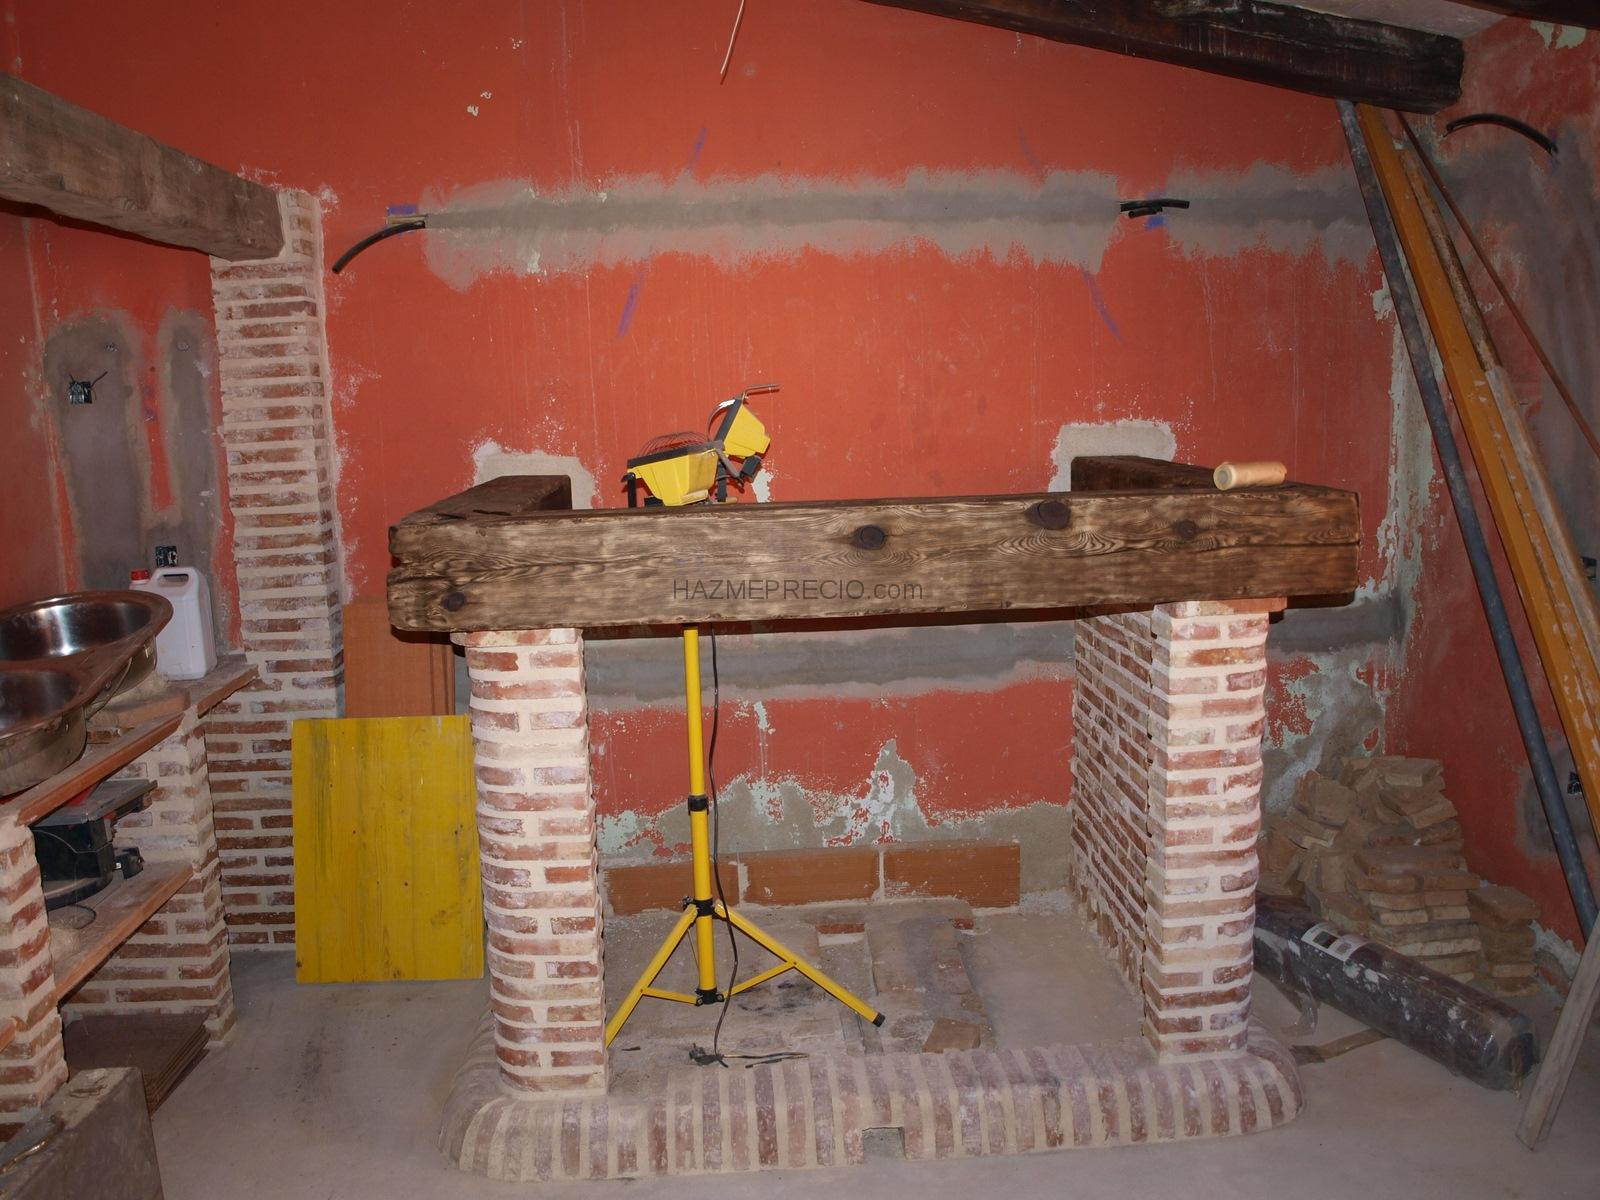 Chimeneas rusticas ladrillo construccion planos de casas - Revestimientos de chimeneas rusticas ...